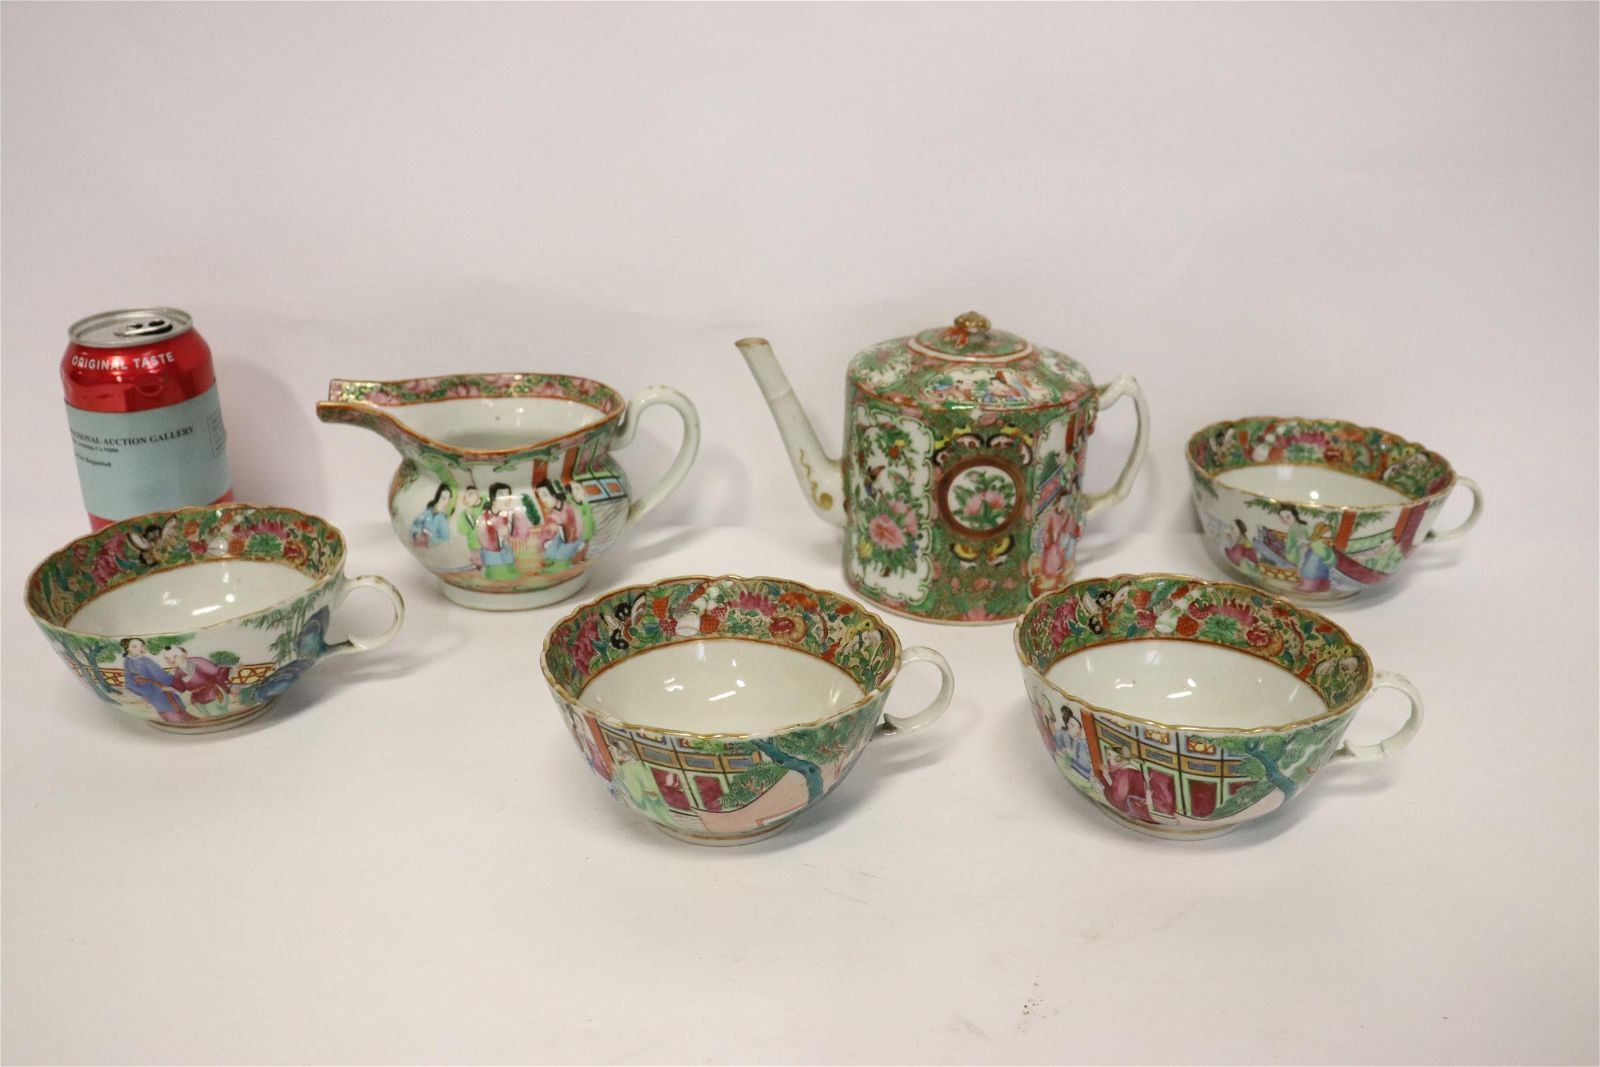 6 piece antique rose canton tea set